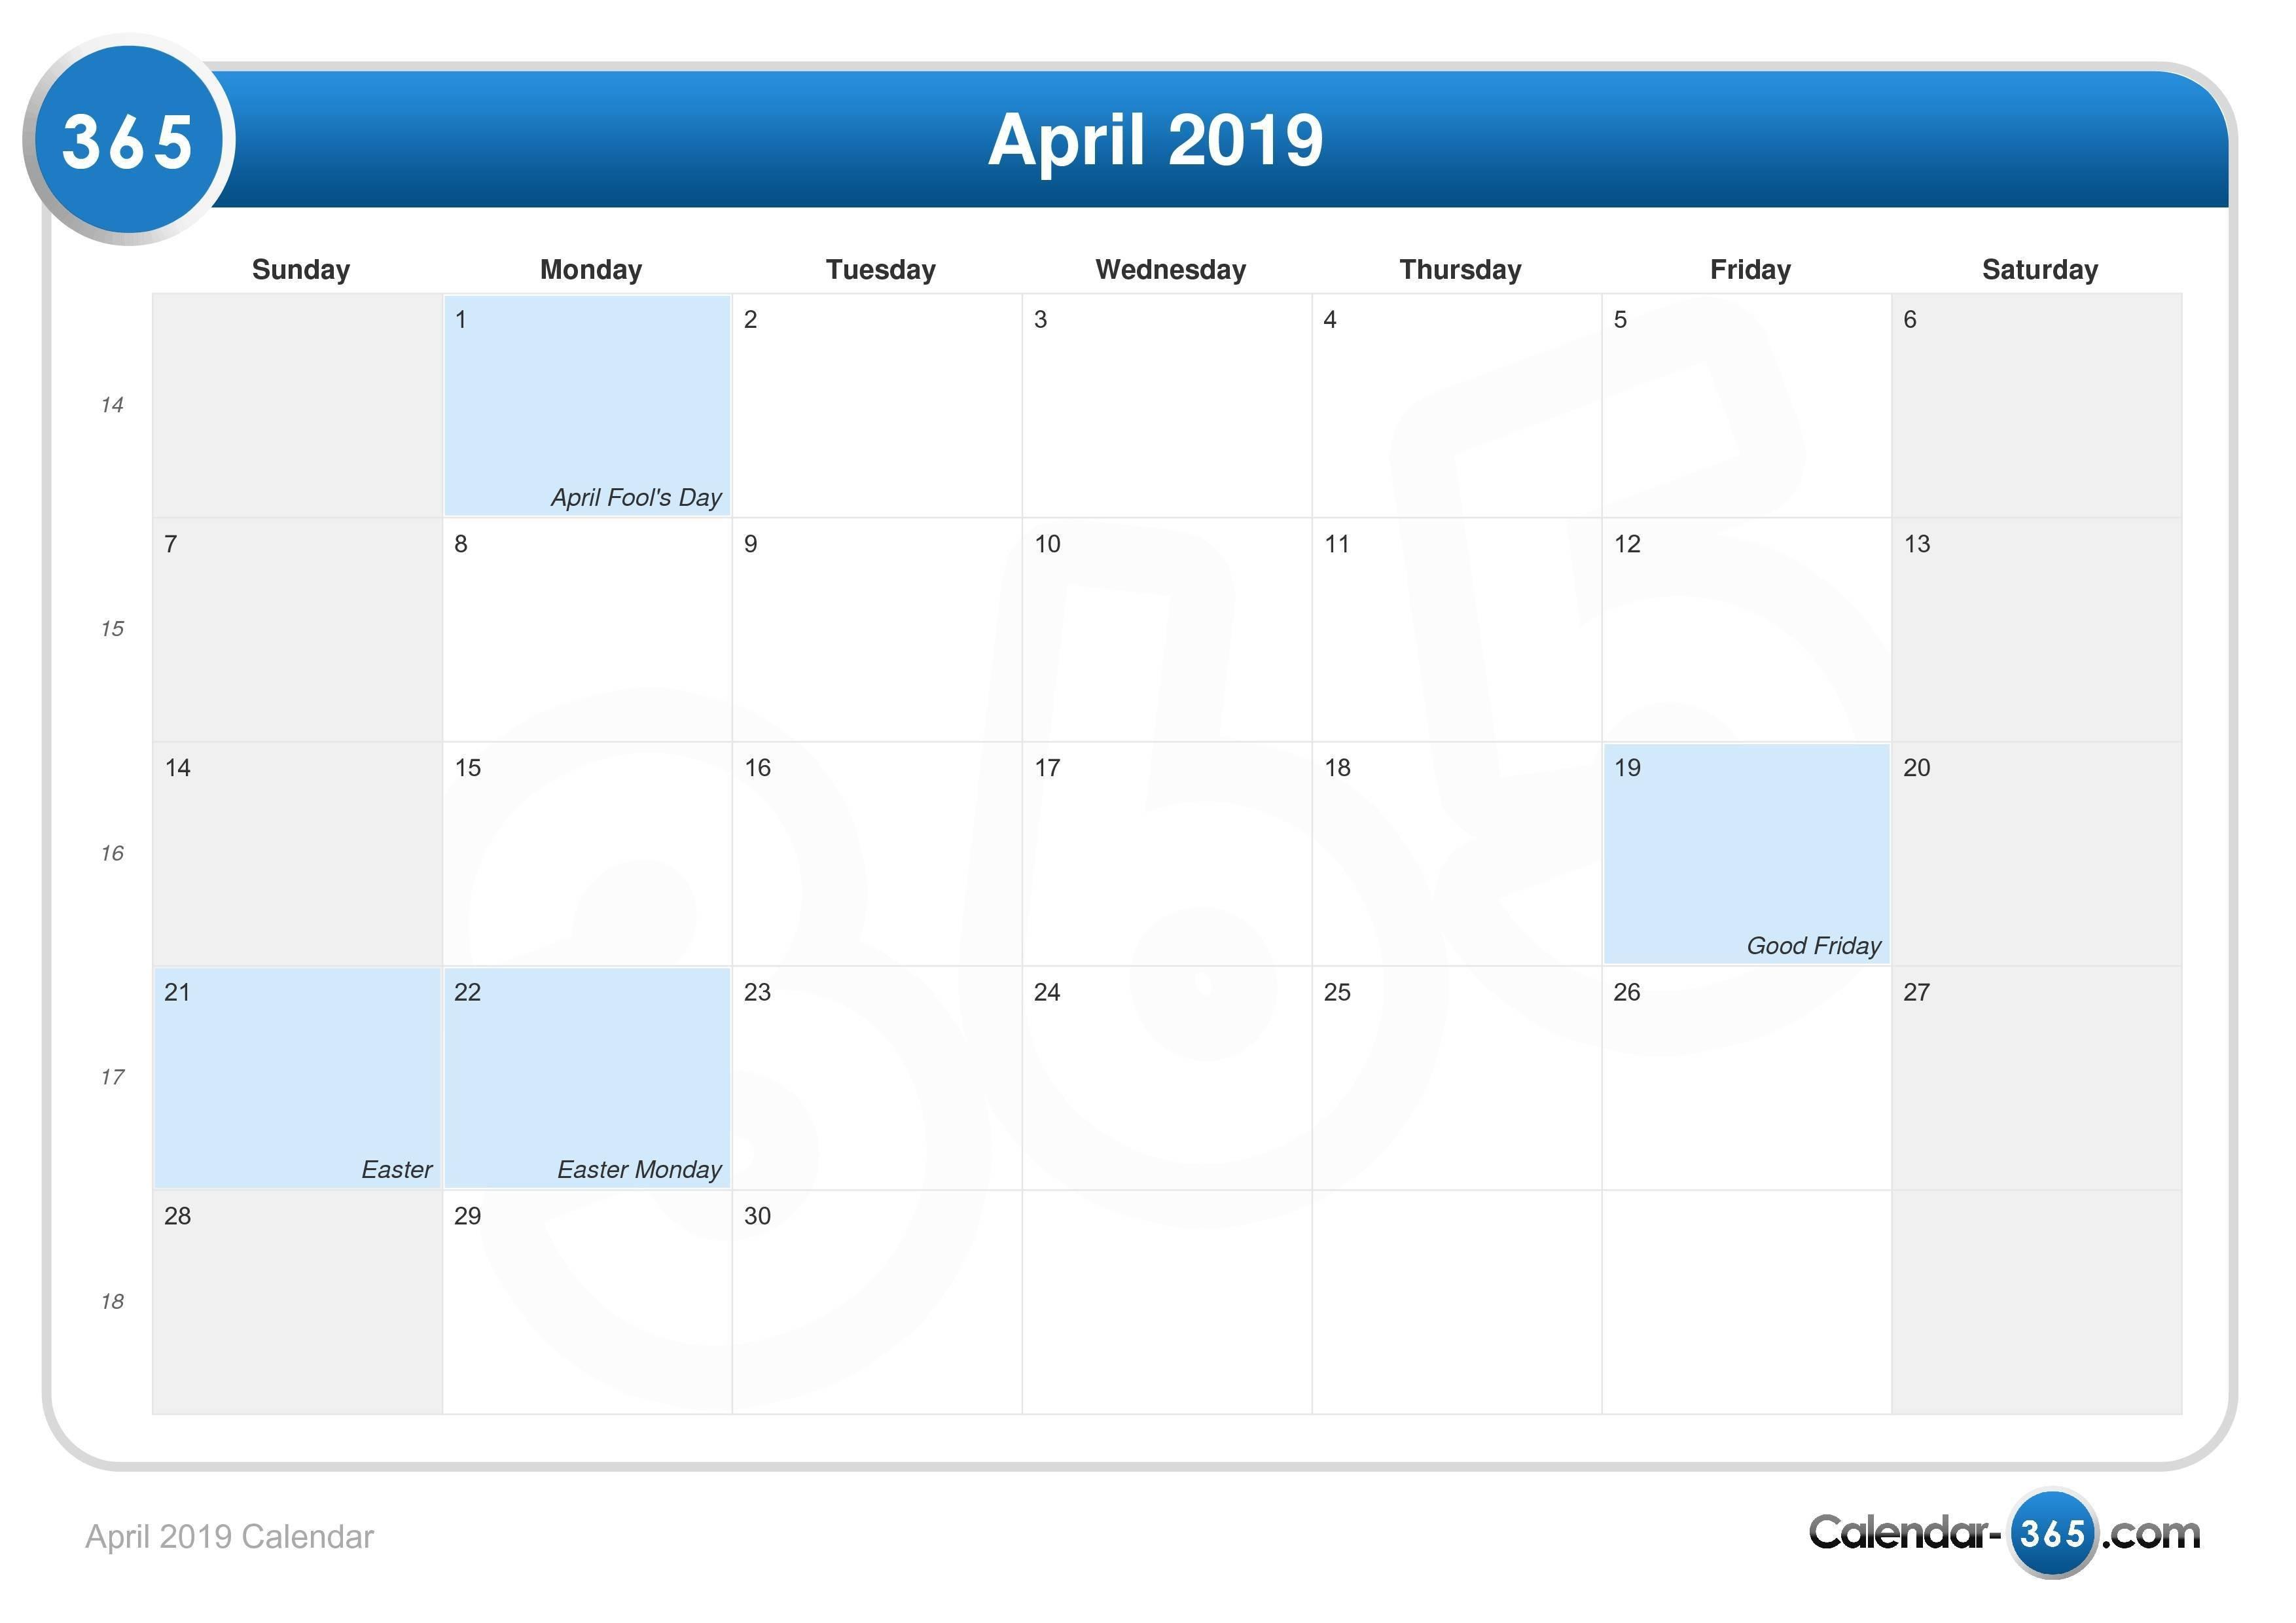 April 2019 Calendar Calendar 2019 Easter